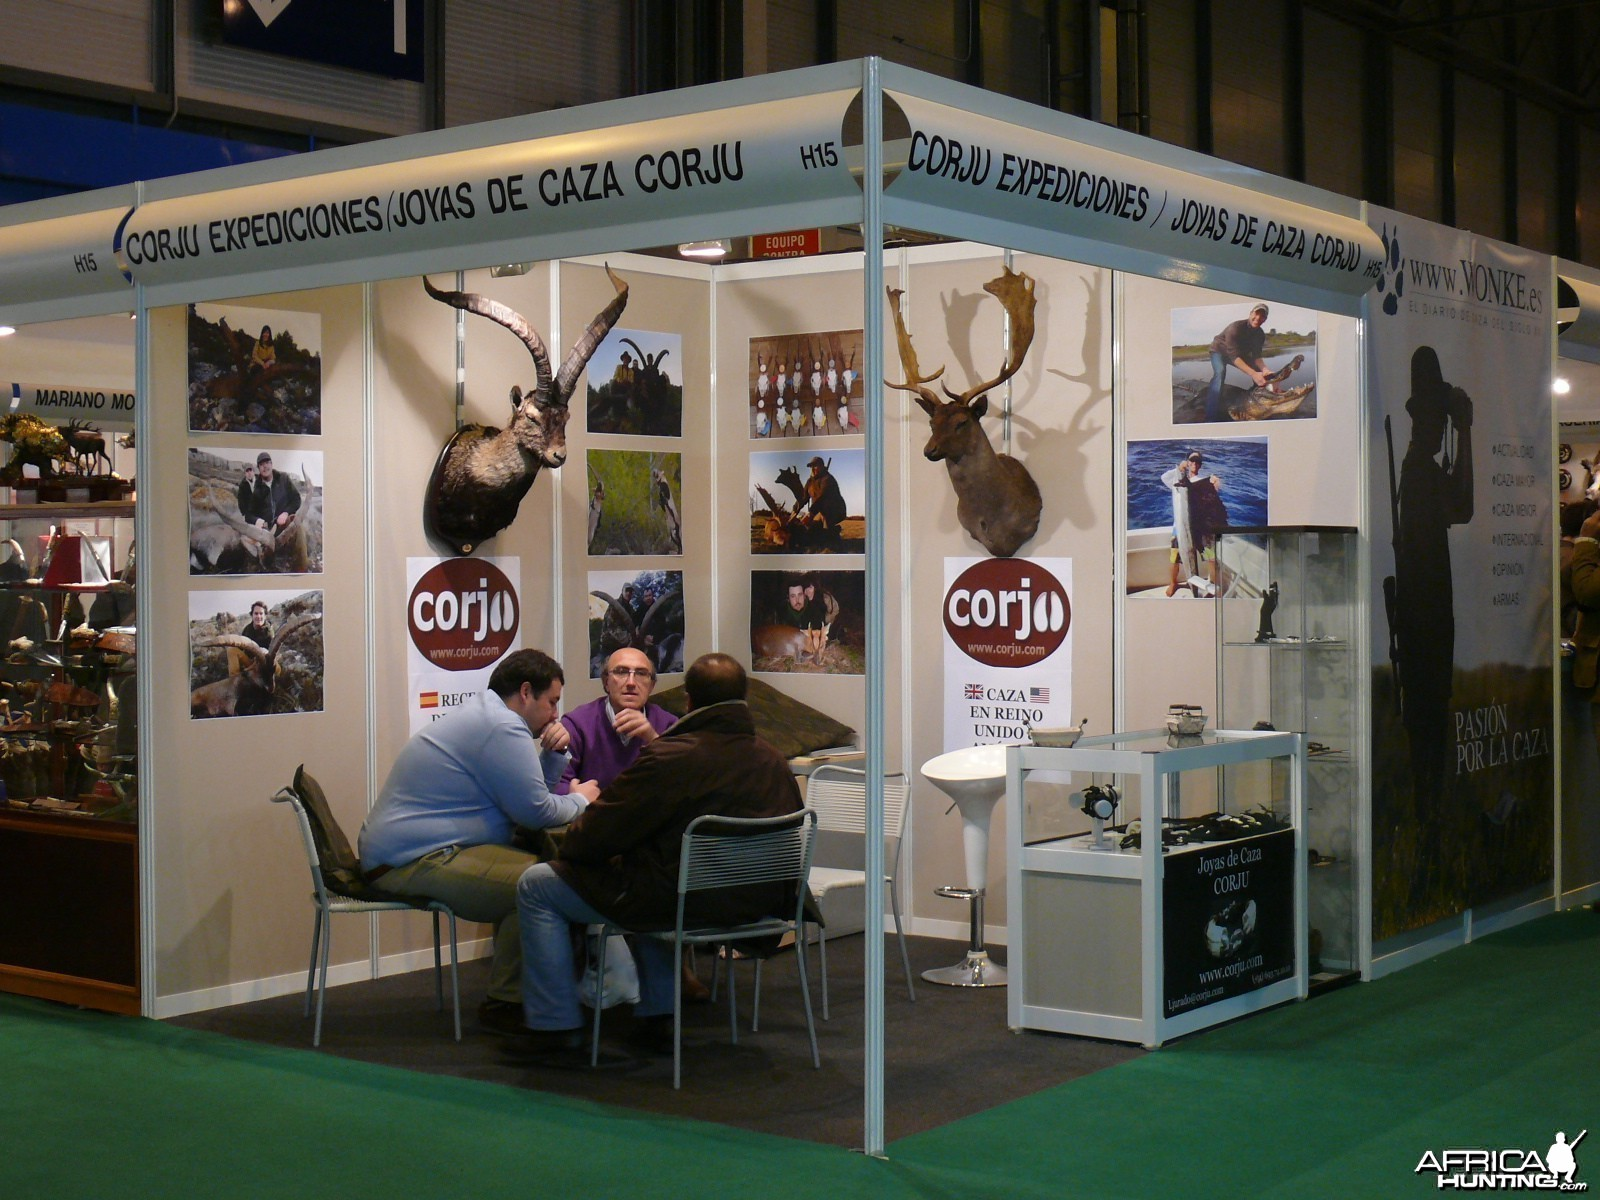 Cinegetica Hunting Show in Madrid Spain